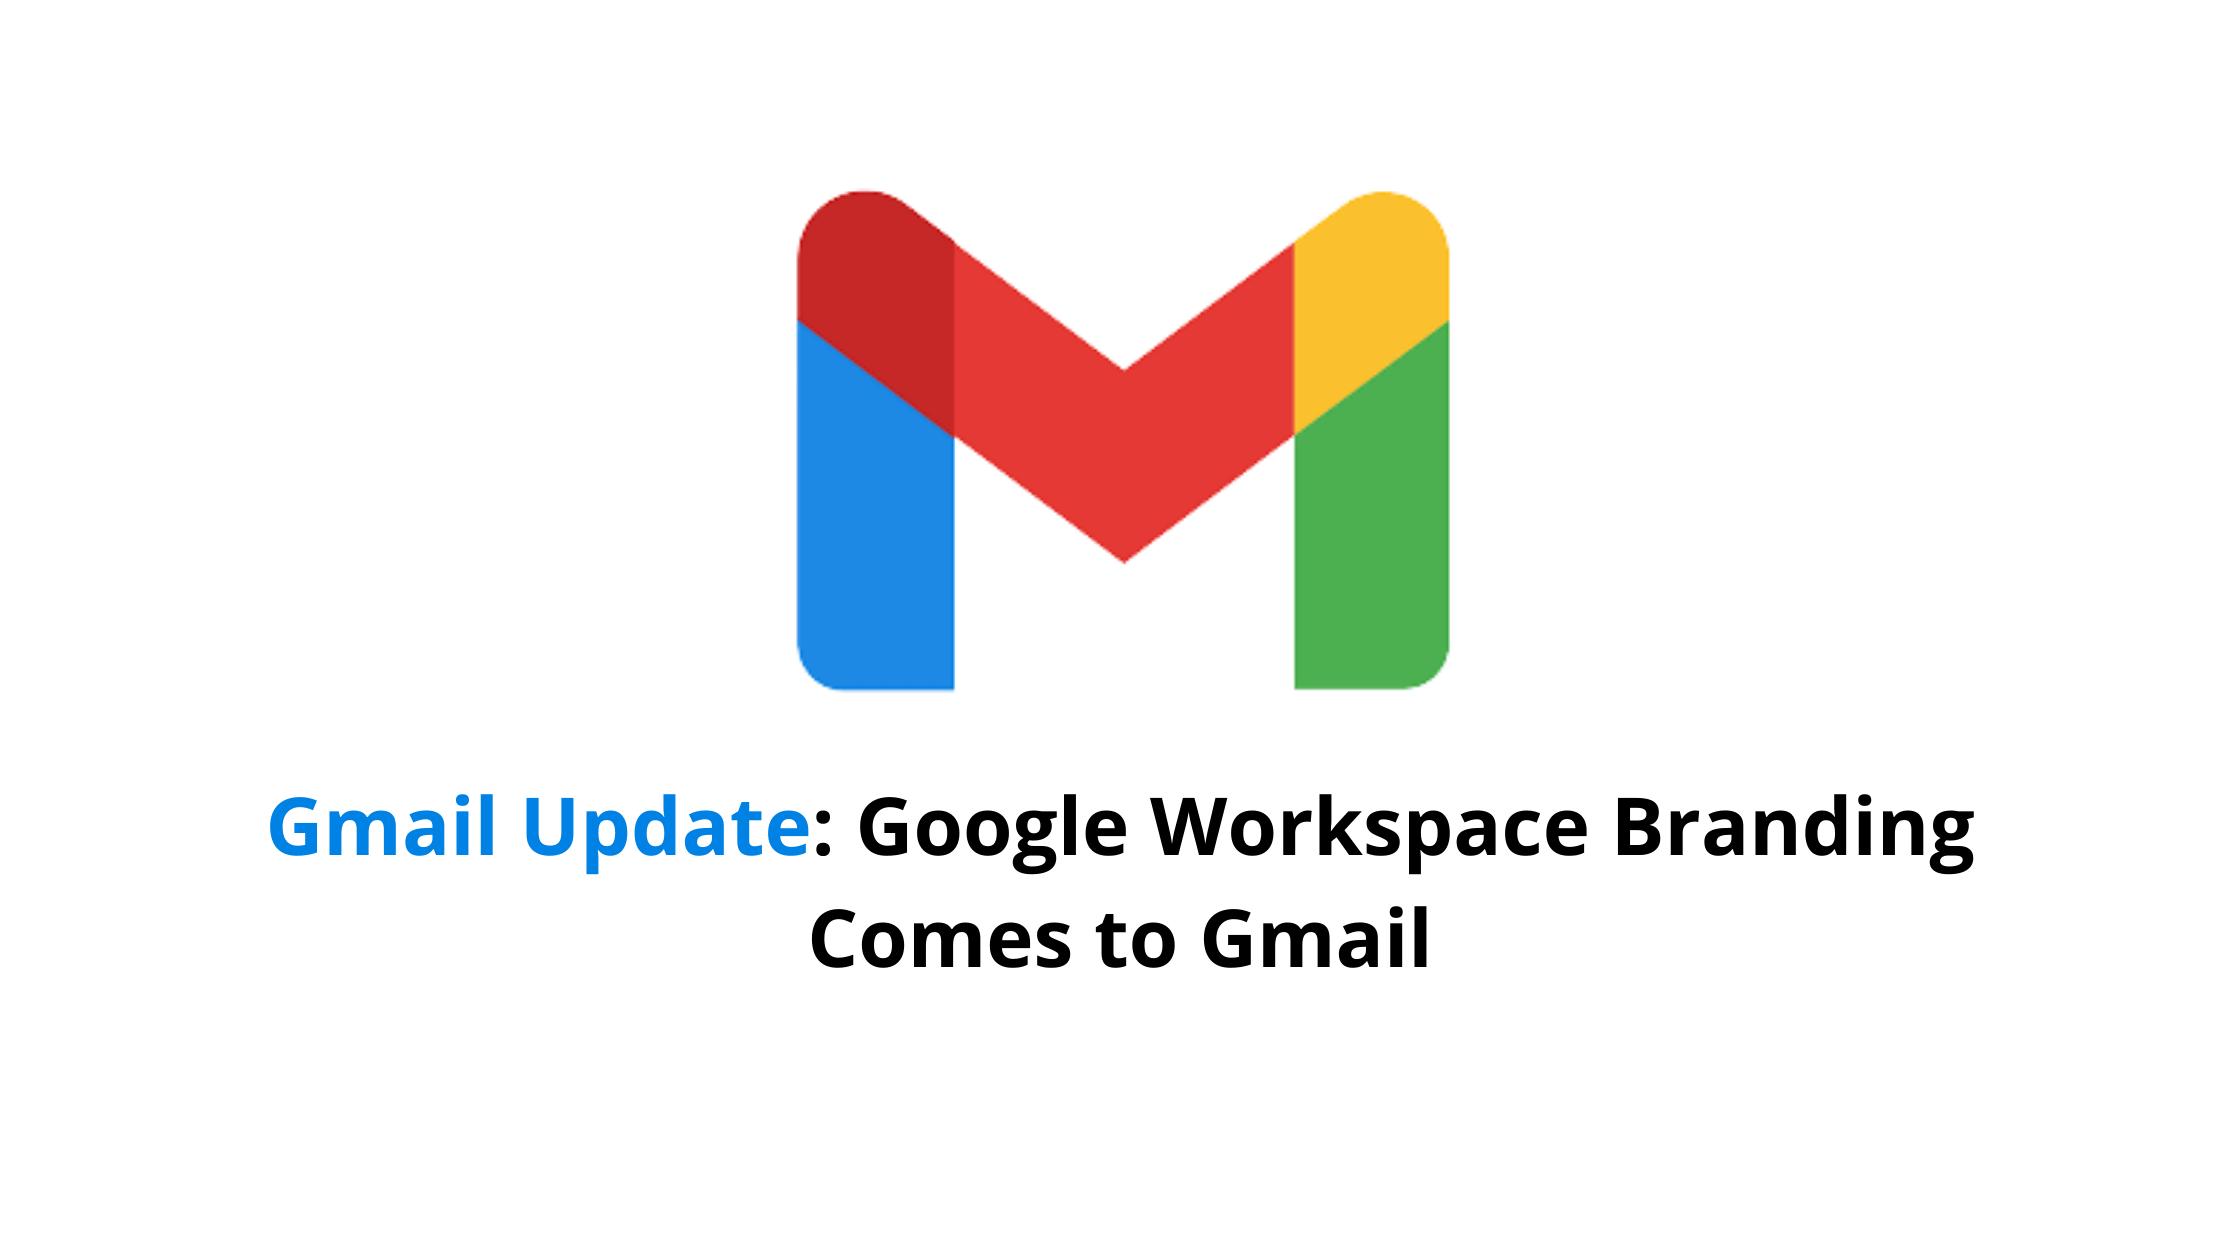 Google workspace branding comes go Gmail